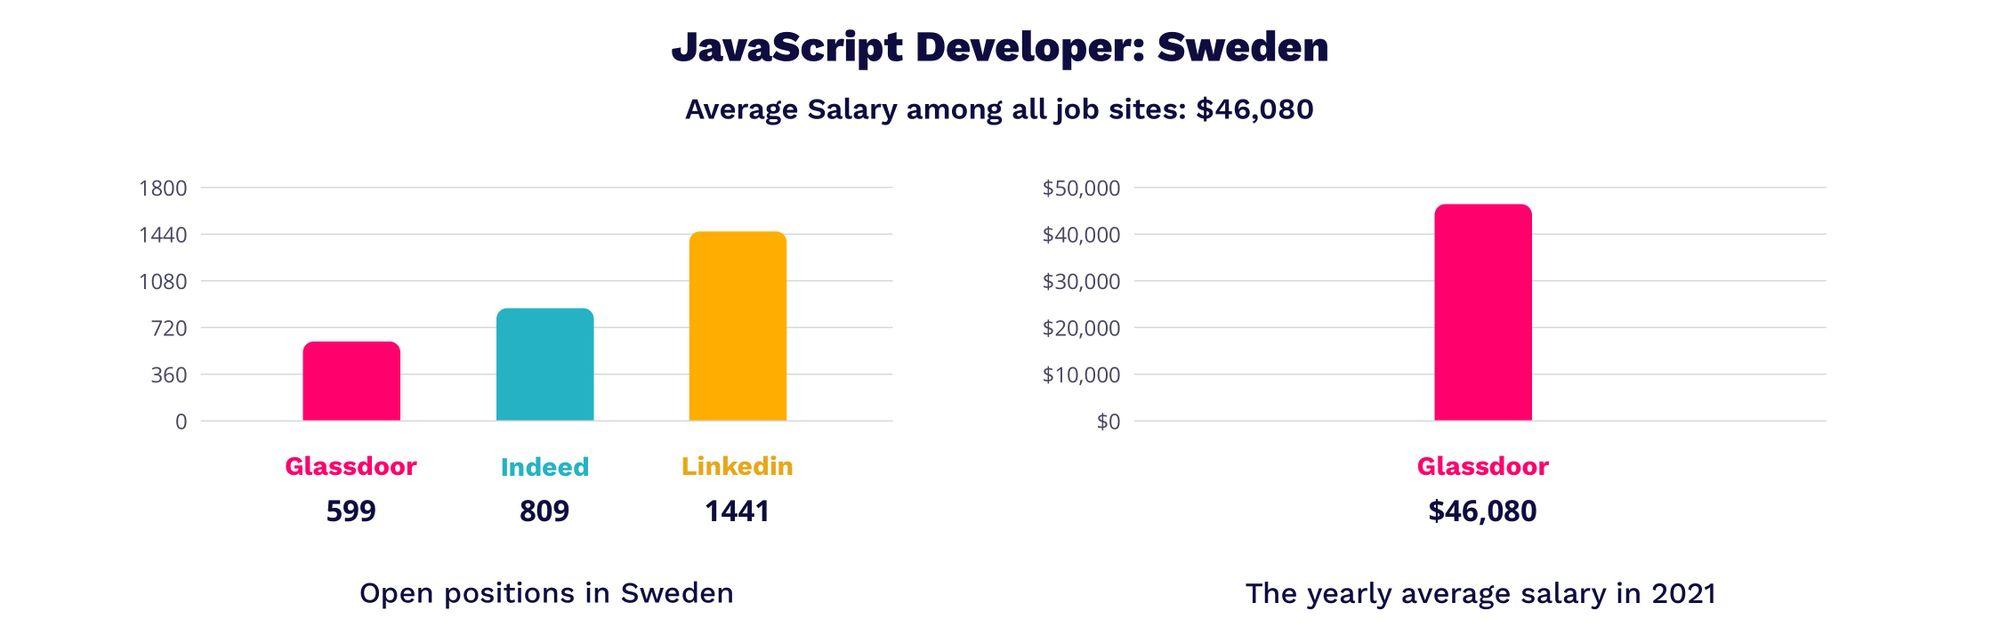 javascript developer salaries in Sweden